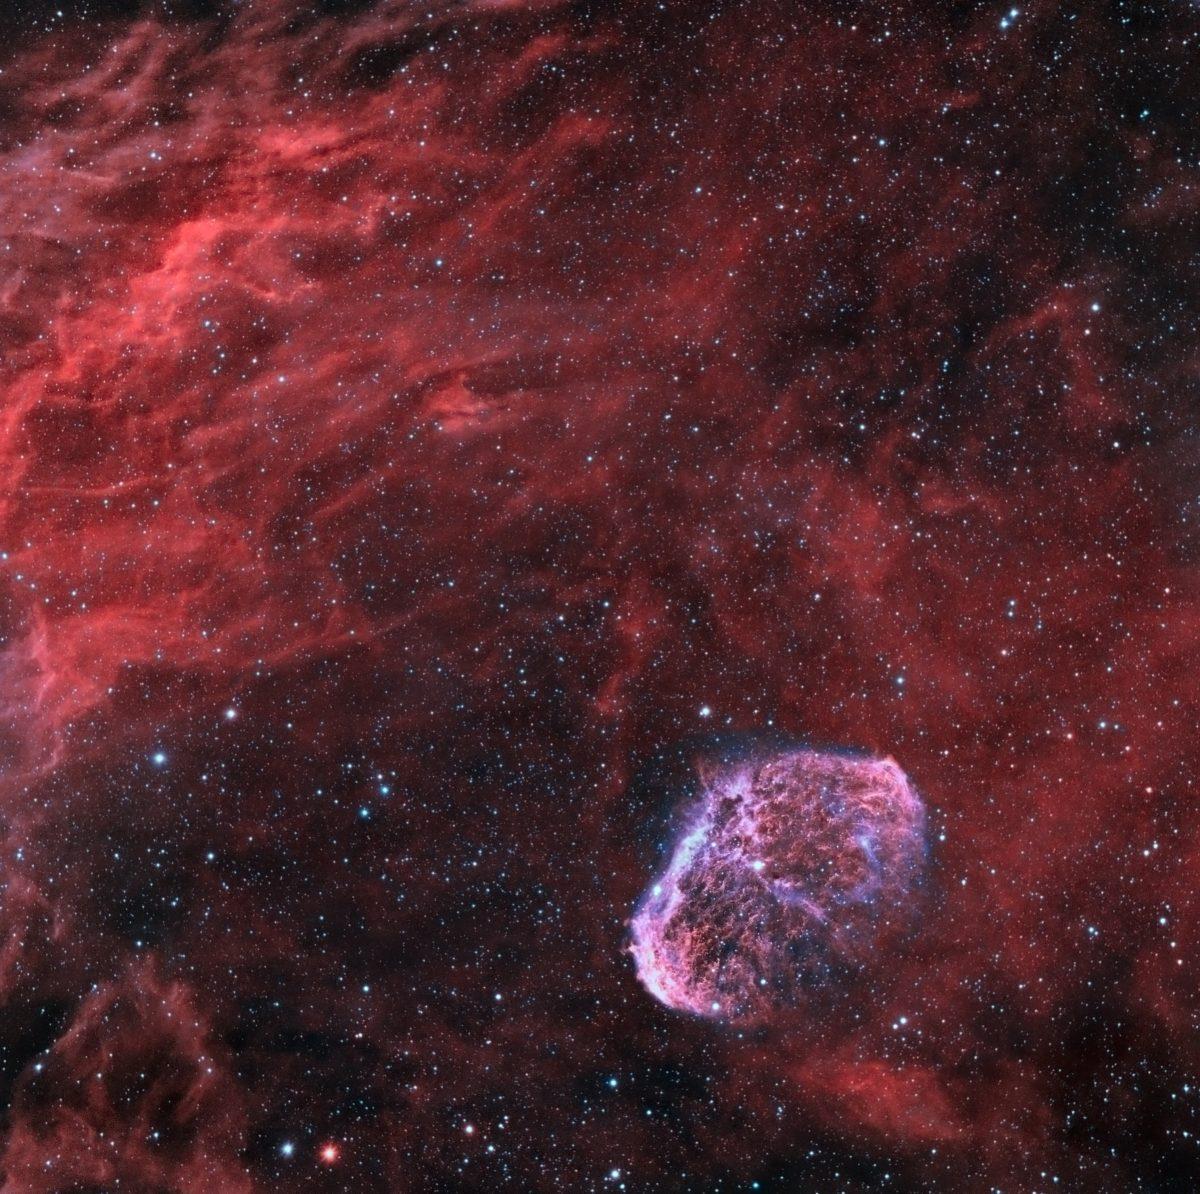 The Crescent Nebula NGC 6888 1200x1194 - NGC 6888 CRESCENT (BRAIN) NEBULA